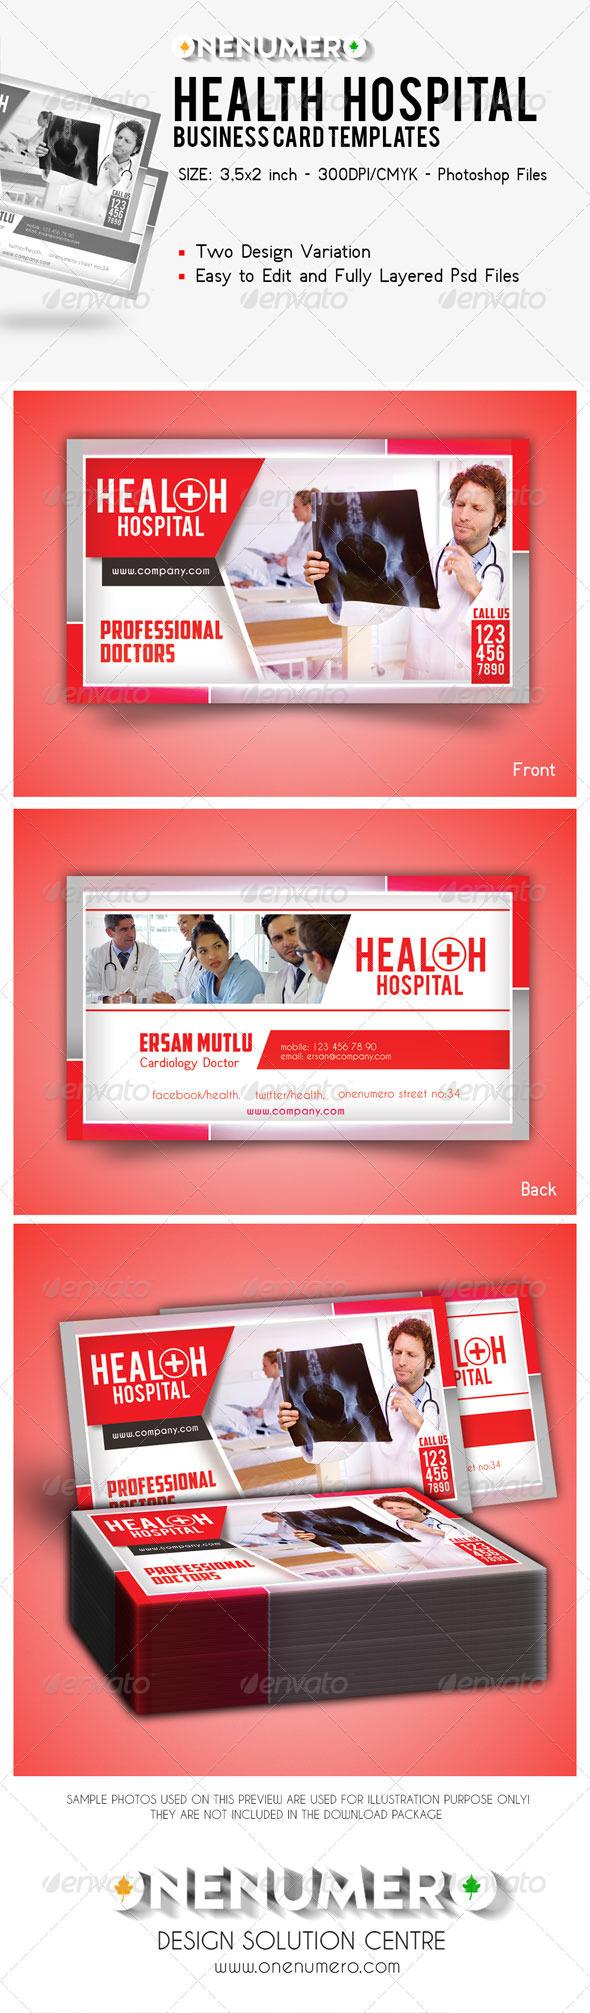 GraphicRiver Health Hospital Business Card Templates 7828261